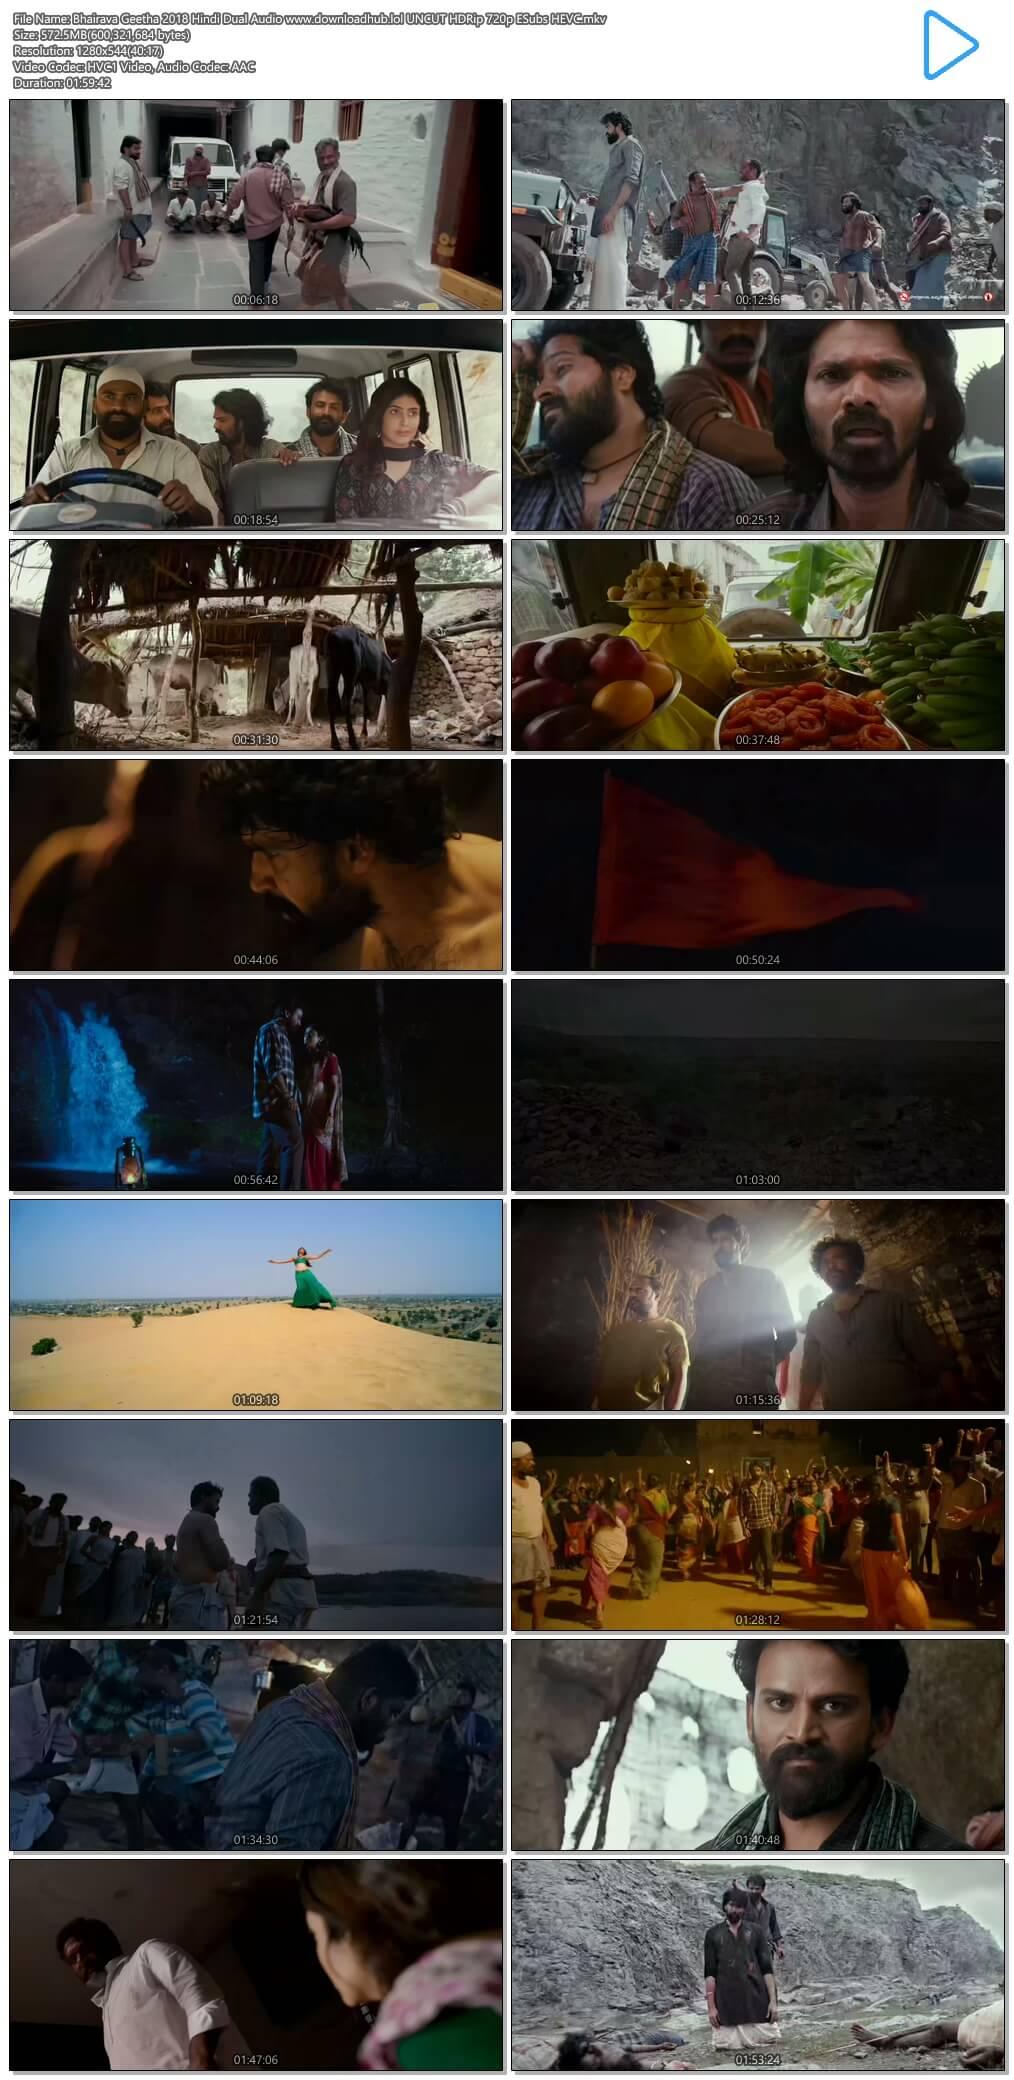 Bhairava Geetha 2018 Hindi Dual Audio 550MB UNCUT HDRip 720p ESubs HEVC